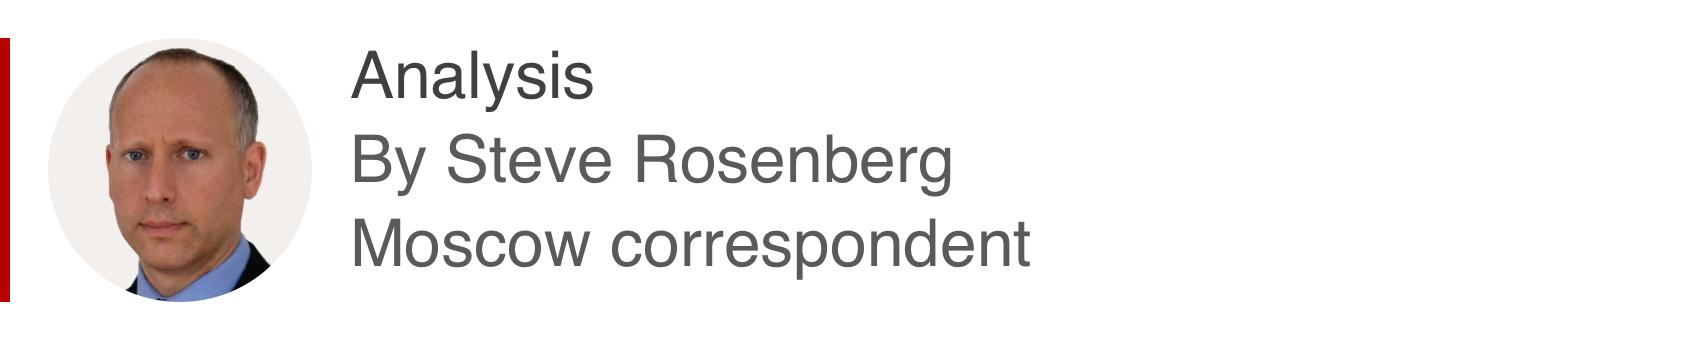 Analysis box by Steve Rosenberg, Moscow correspondent